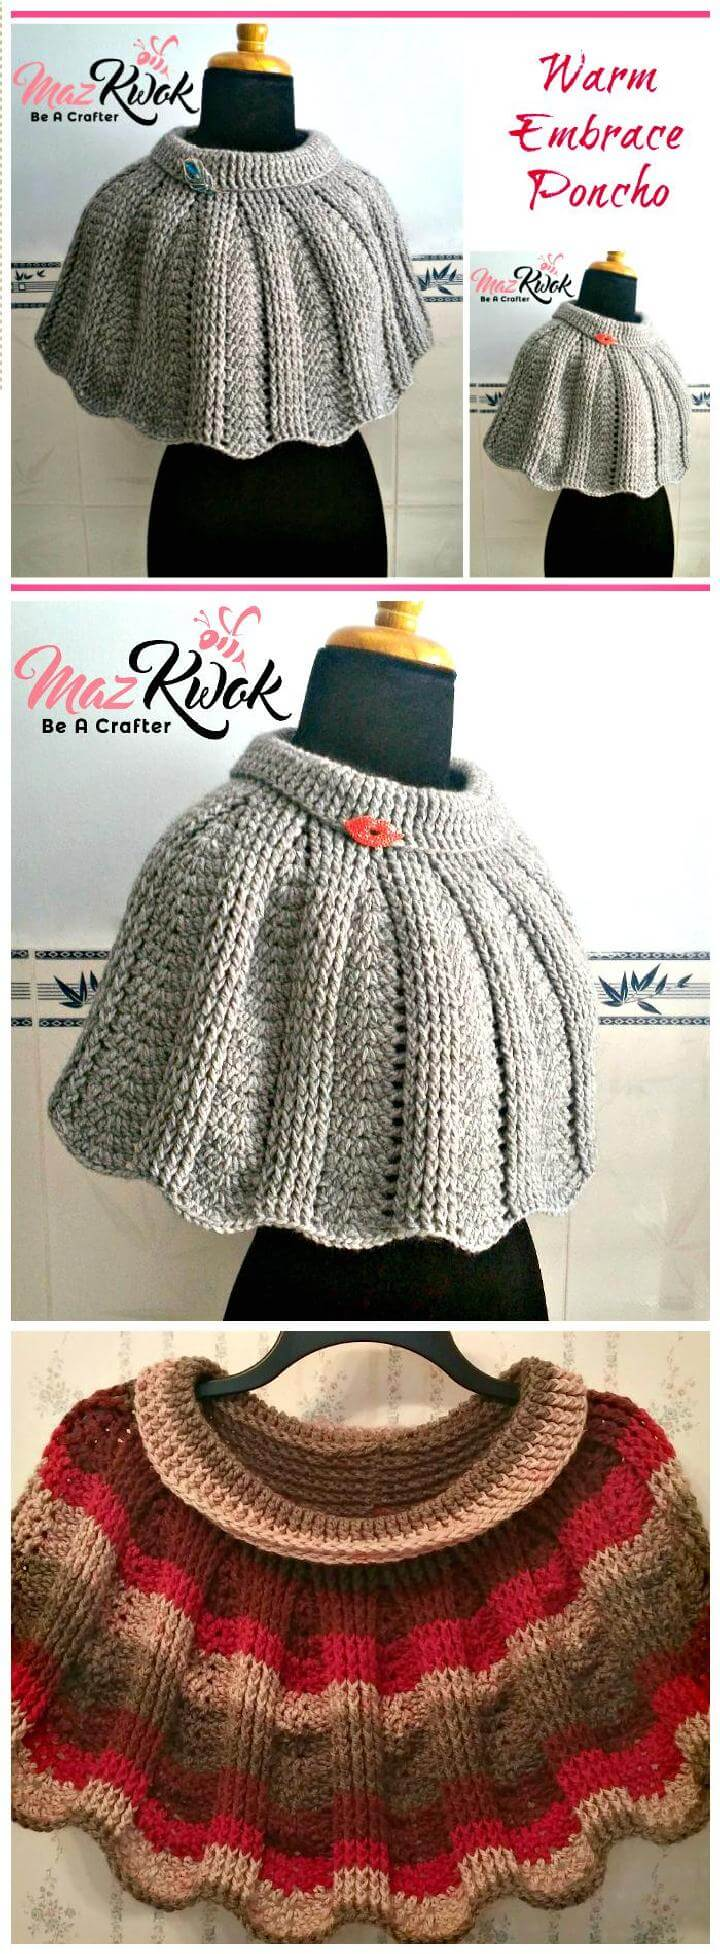 Crochet Warm Embrace poncho